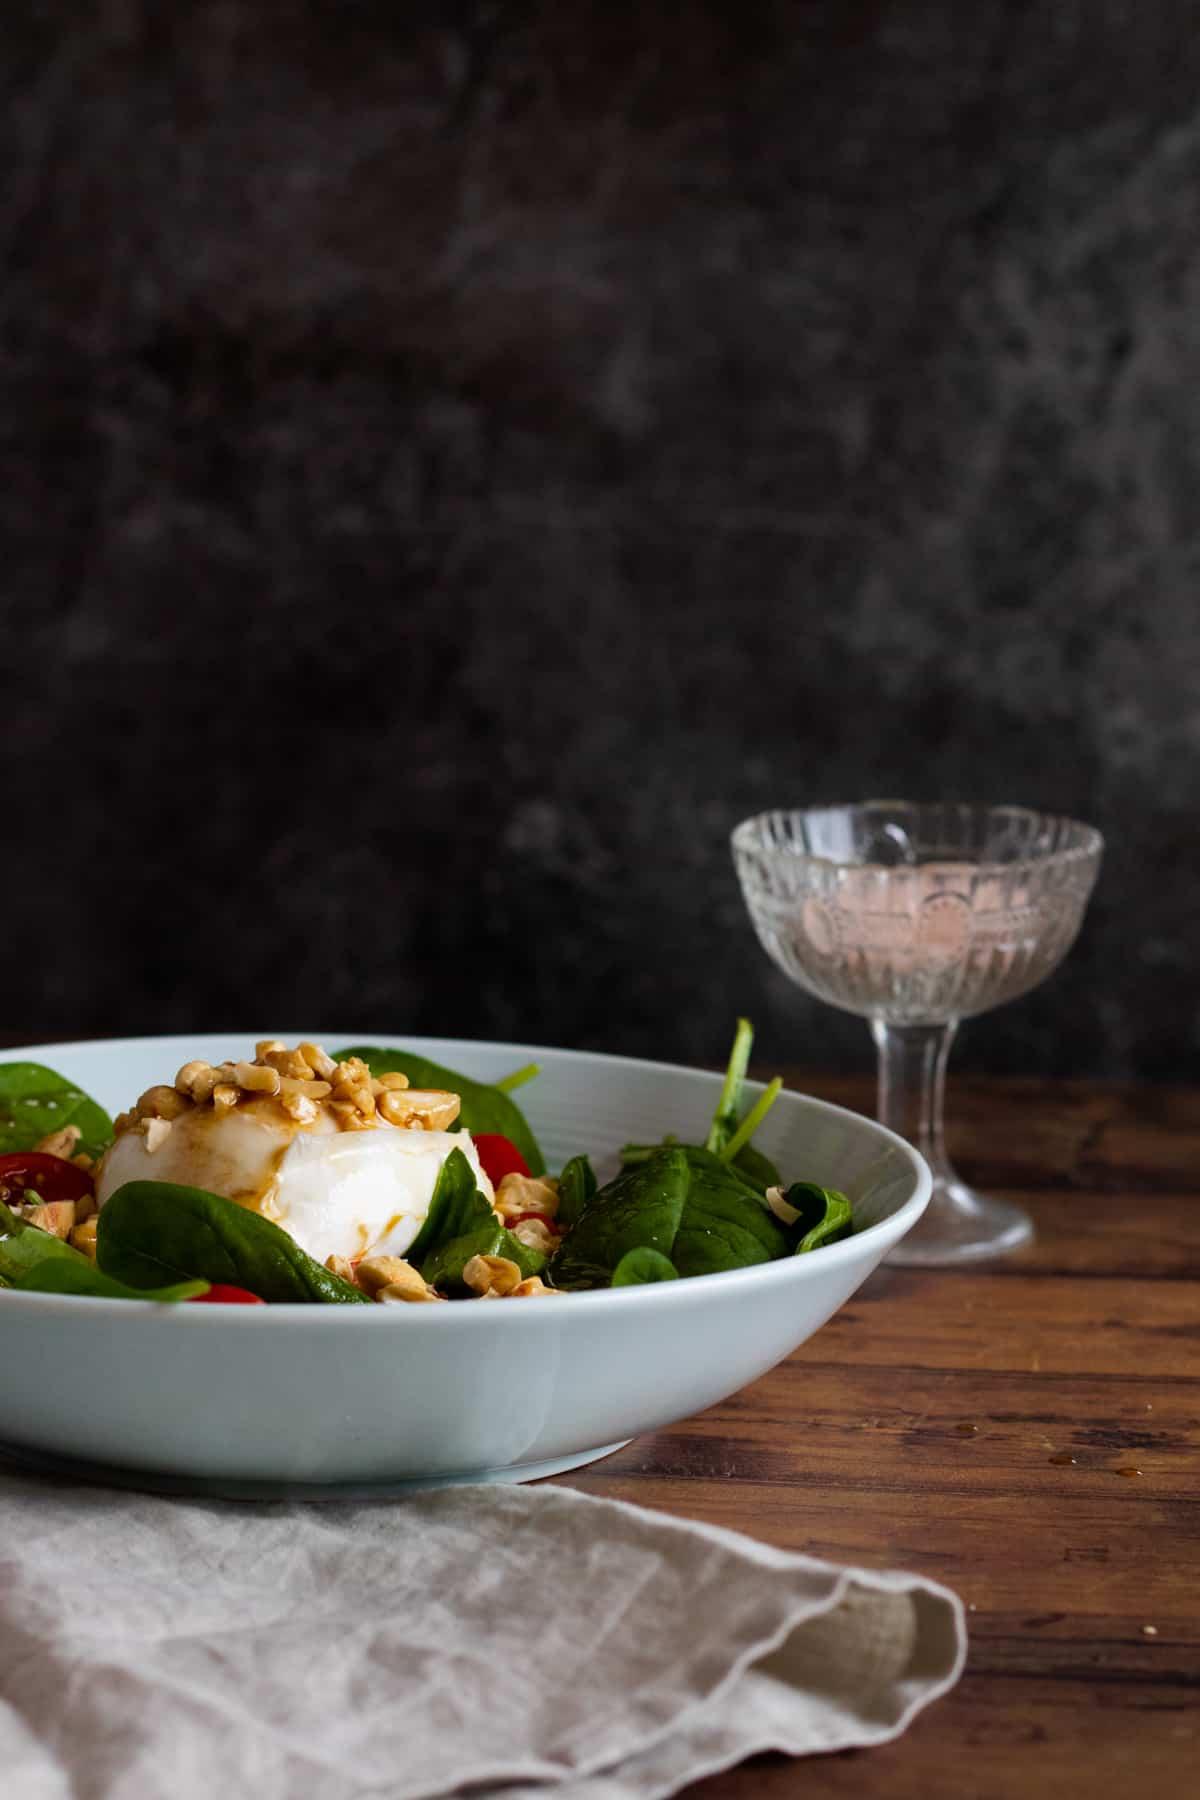 sidew view of a burrata caprese salad on a light blue deep plate